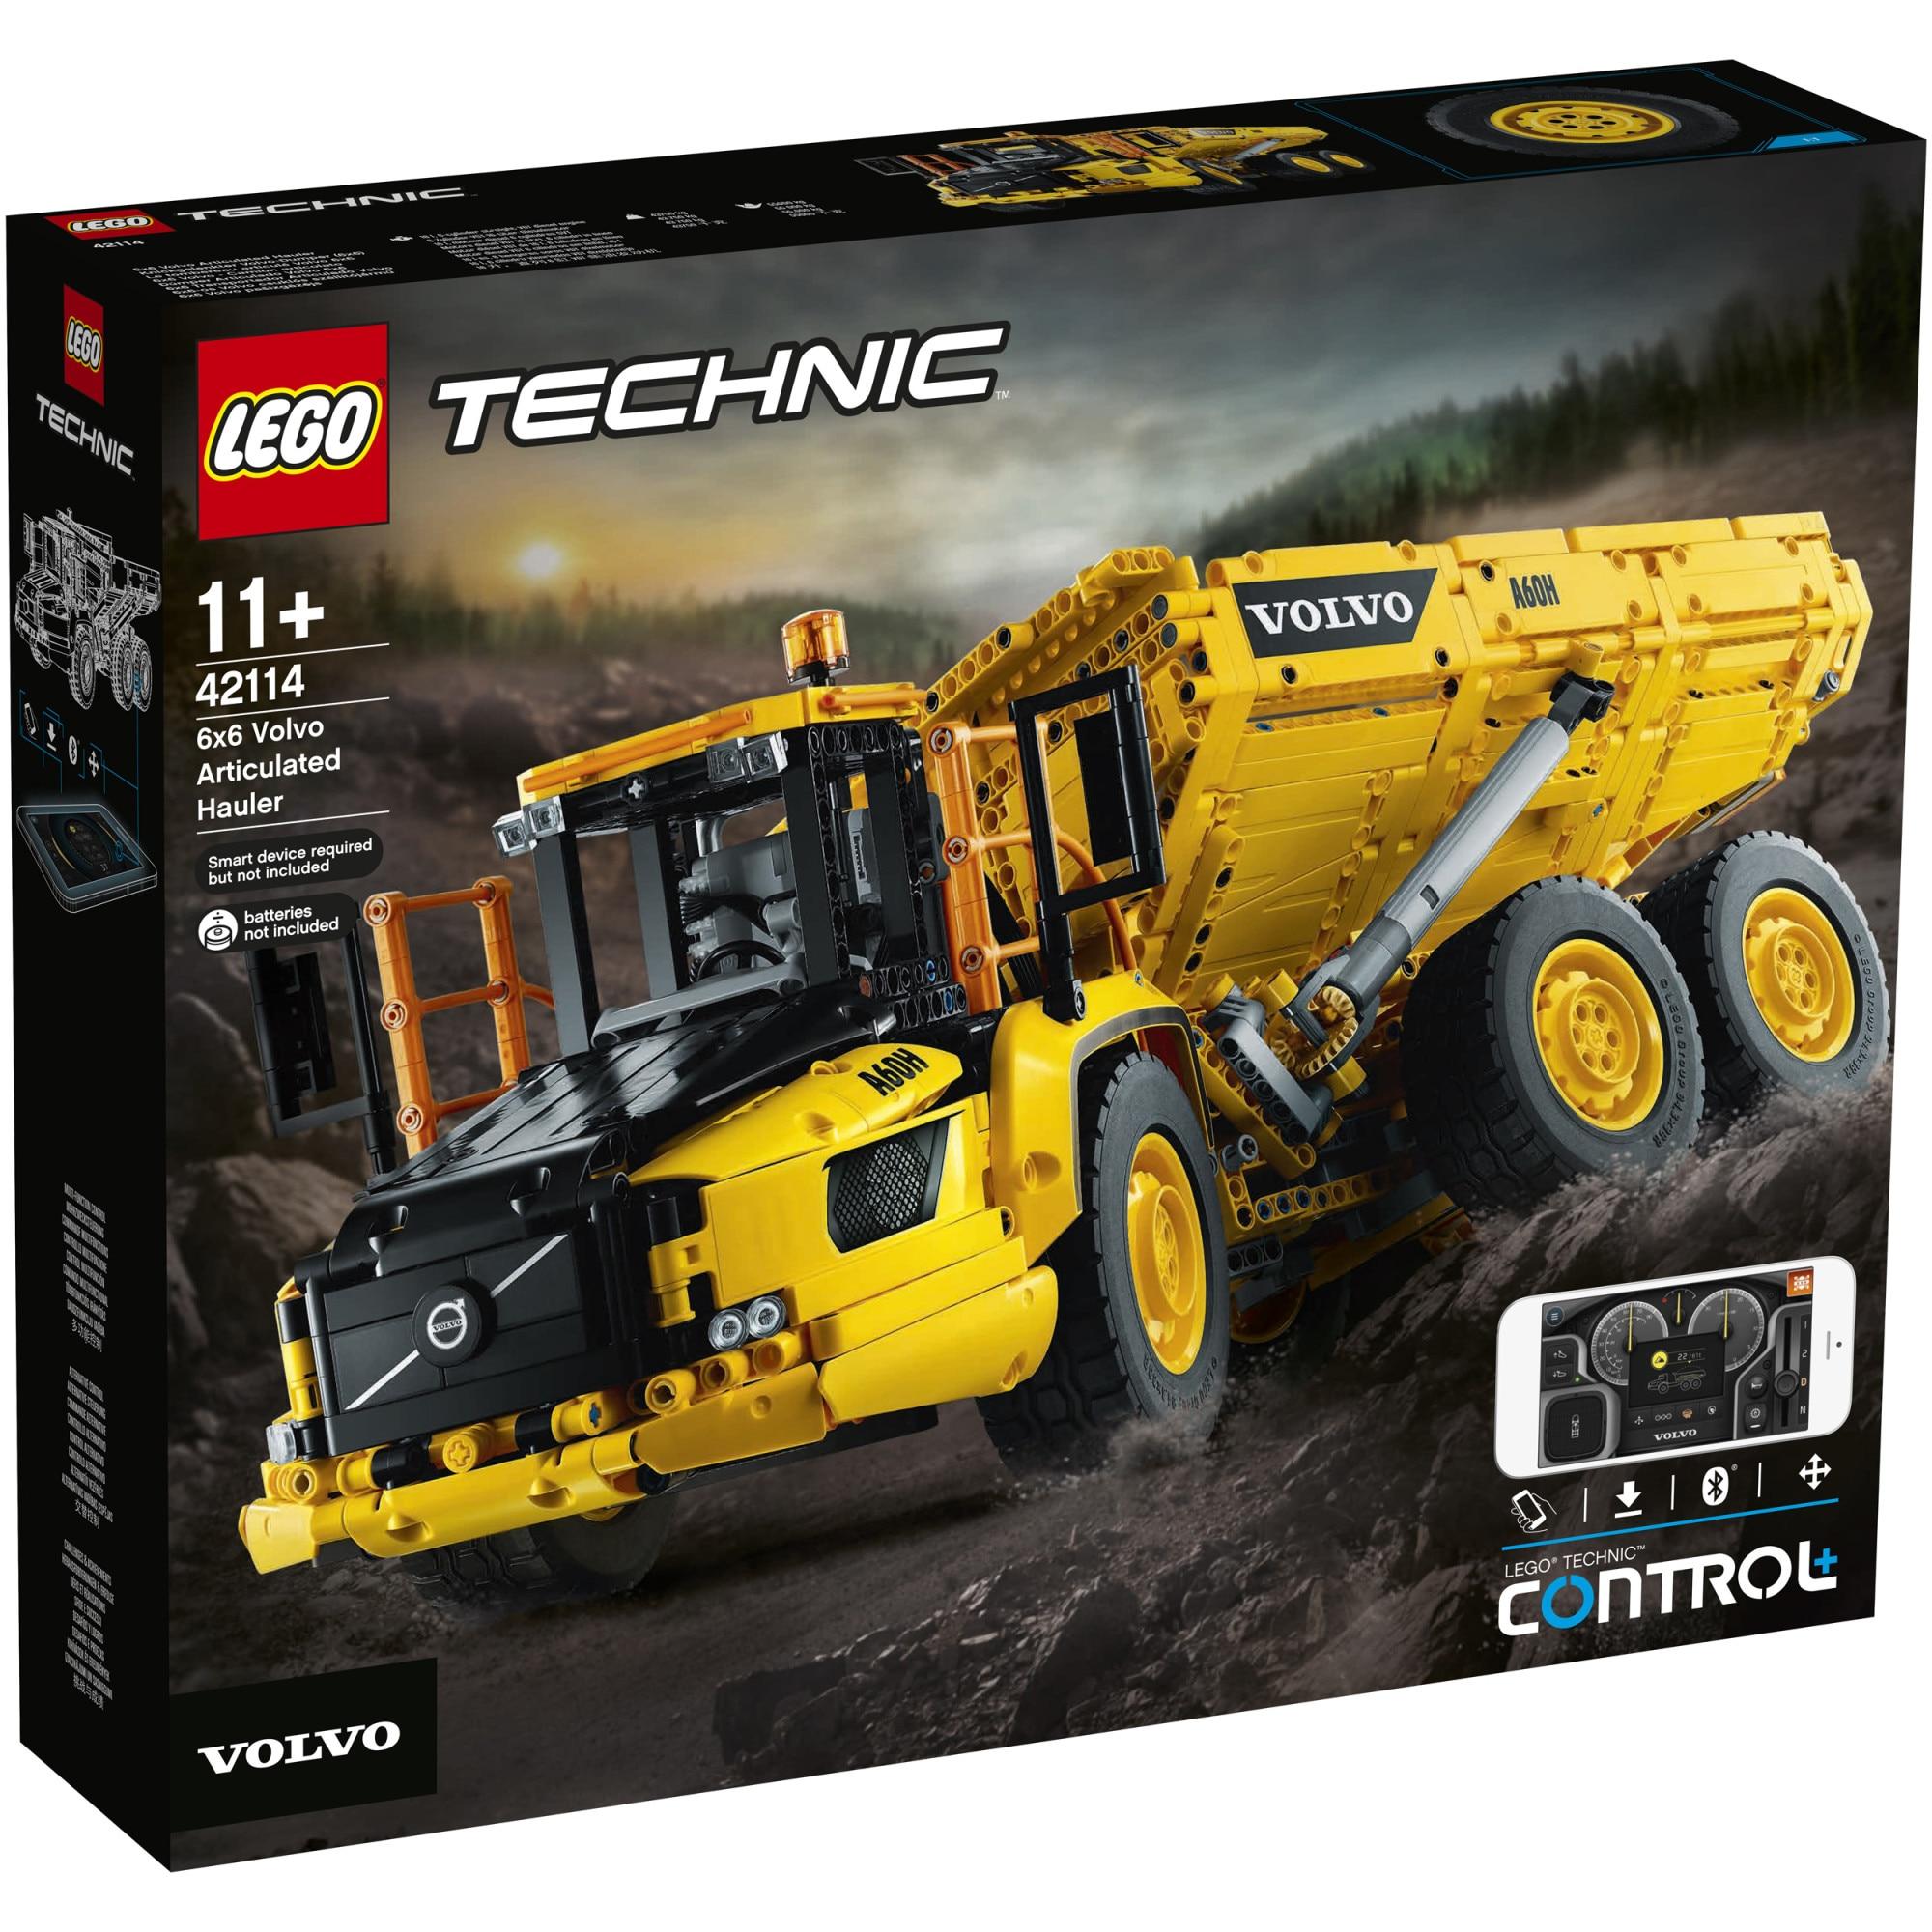 Fotografie LEGO Technic - Transportor Volvo 6x6 42114, 2193 piese